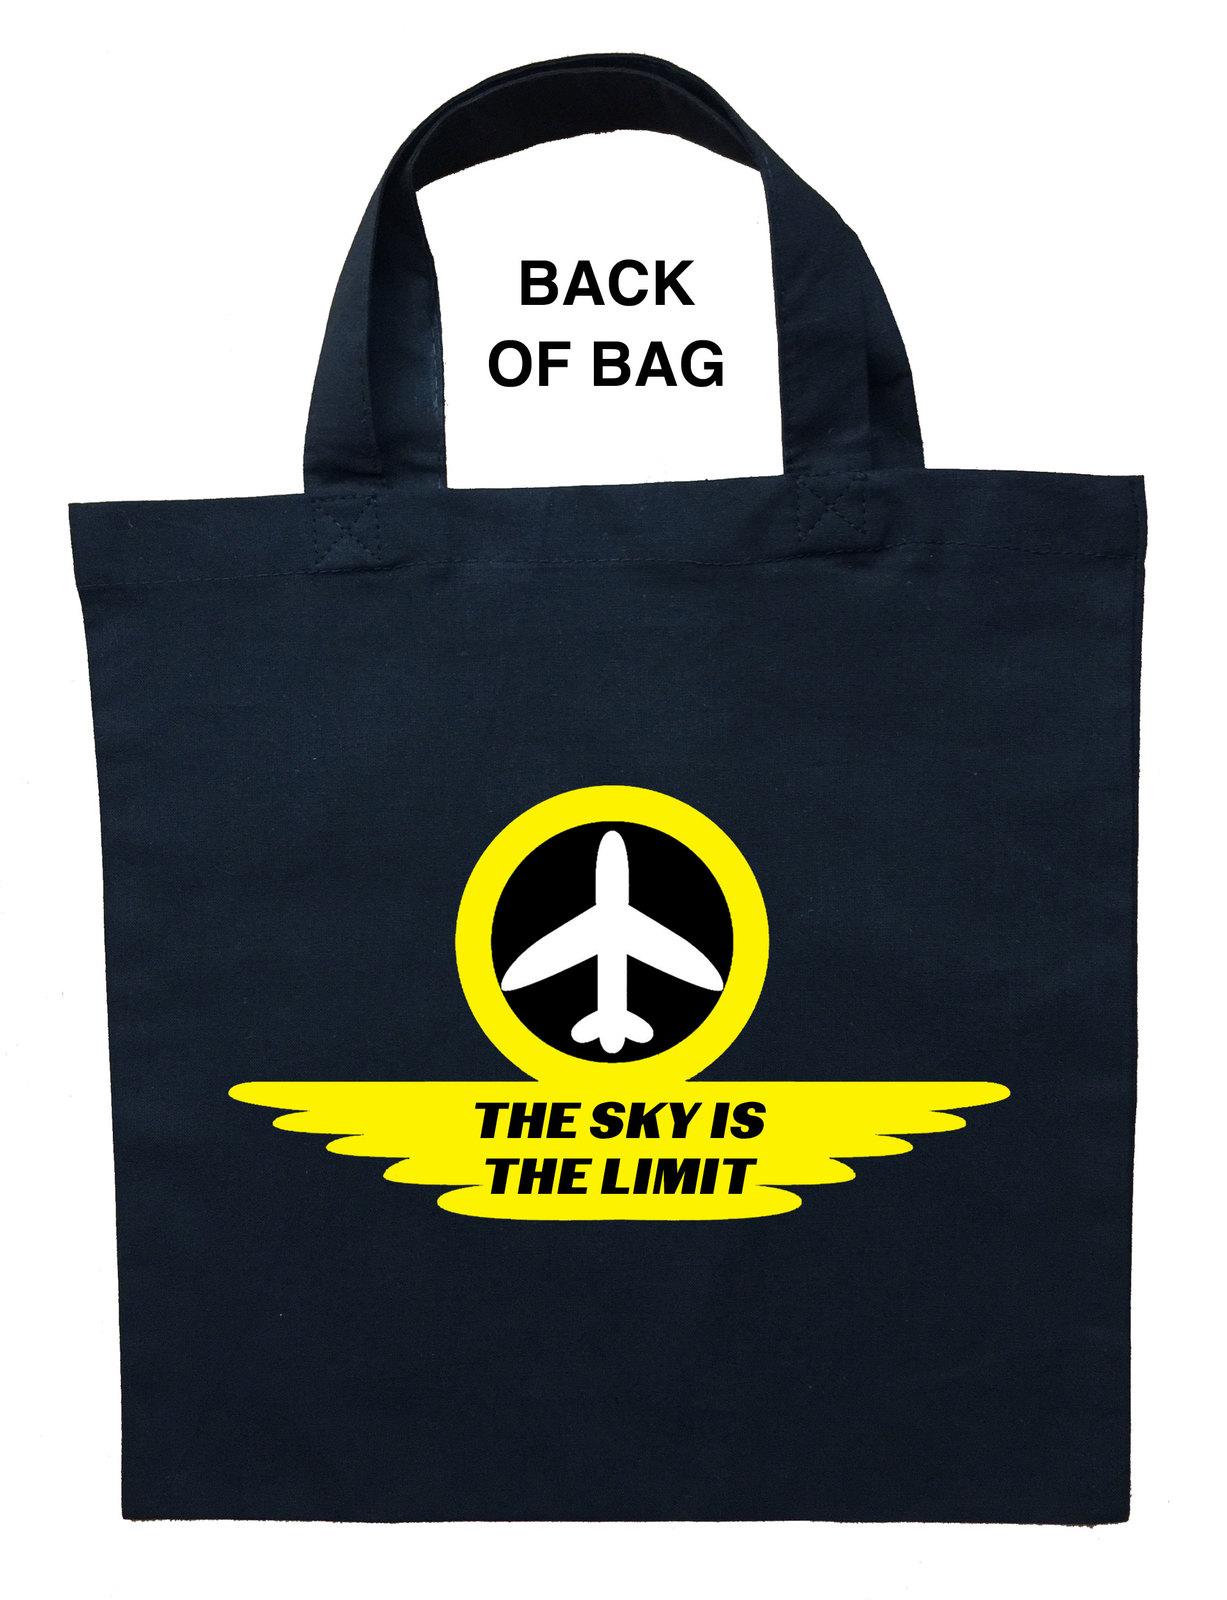 Pilot Trick or Treat Bag, Airline Pilot Halloween Bag, Pilot Loot Bag